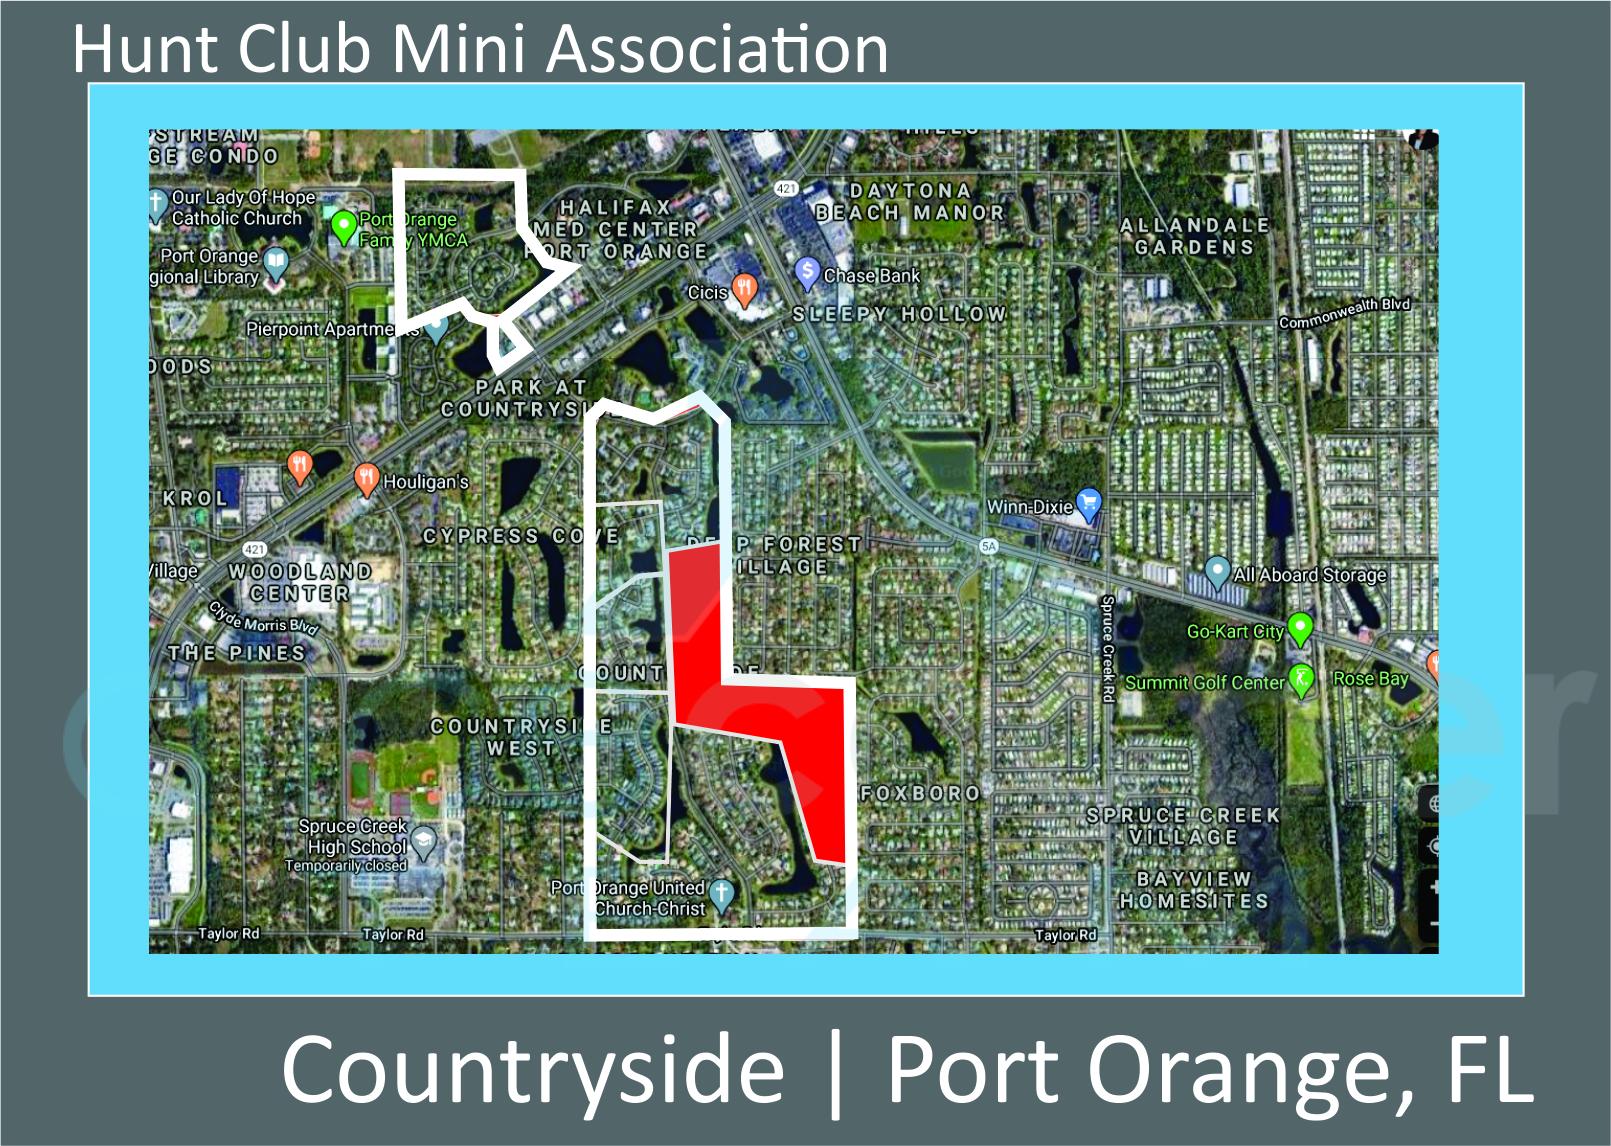 Map of Hunt Club in Countryside Neighborhood